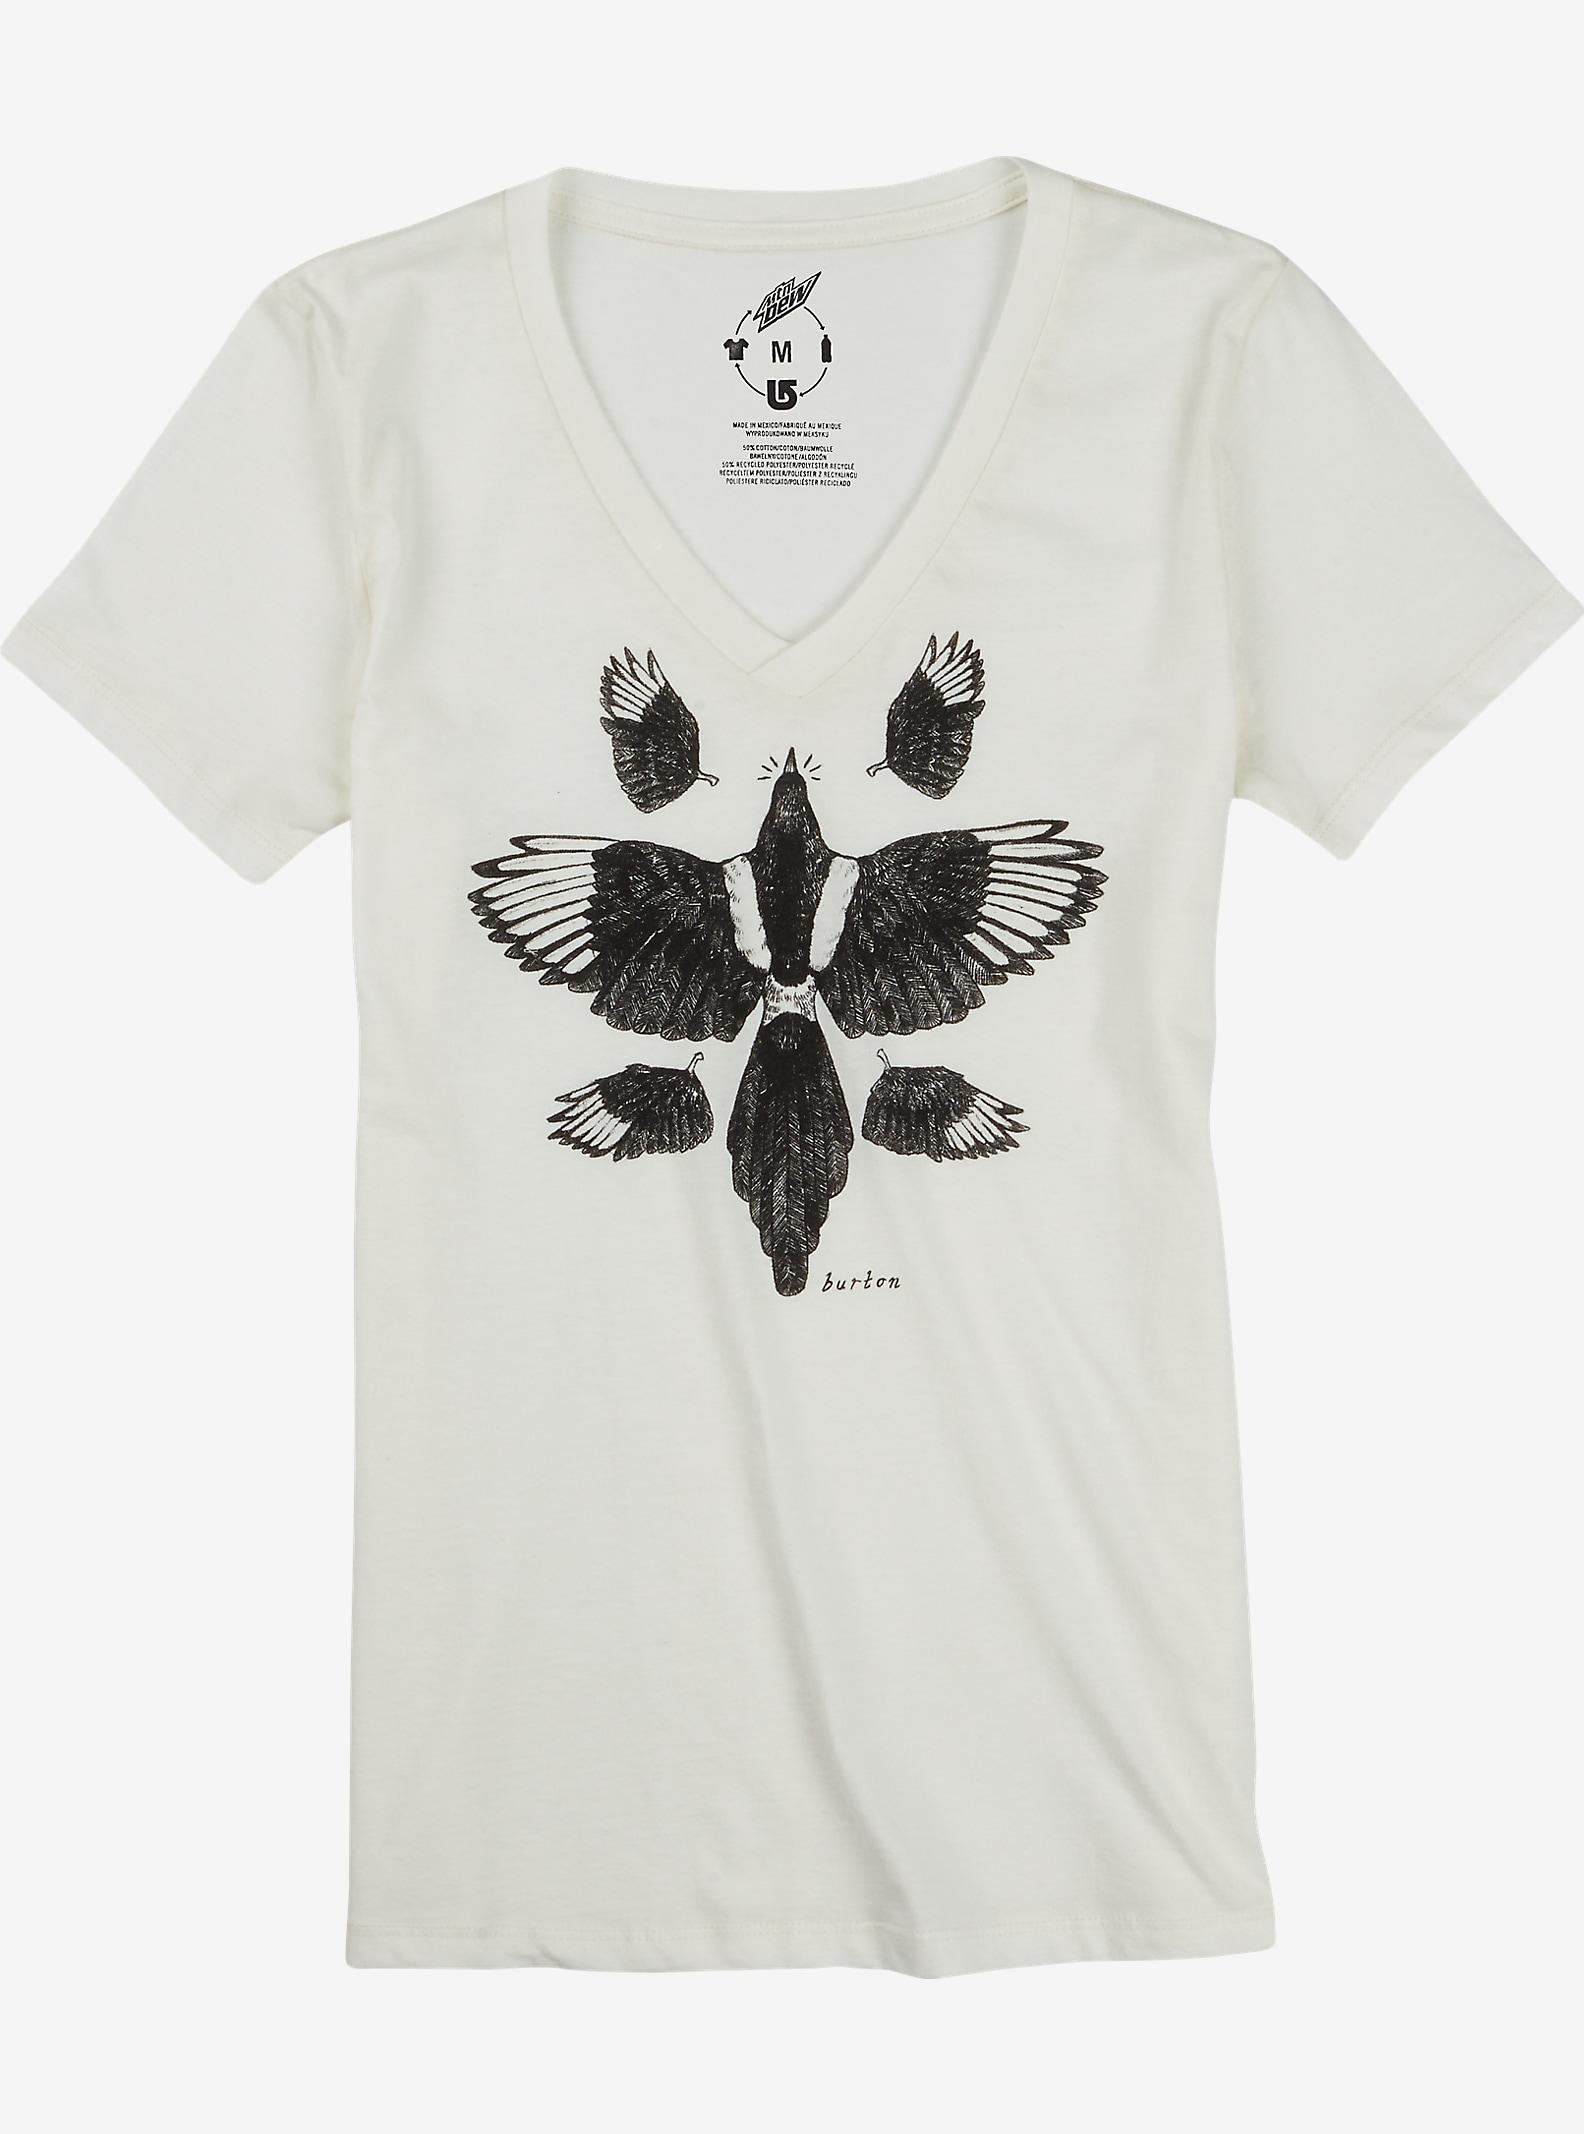 Burton Starling V-Neck Recycled T Shirt shown in Vanilla Heather